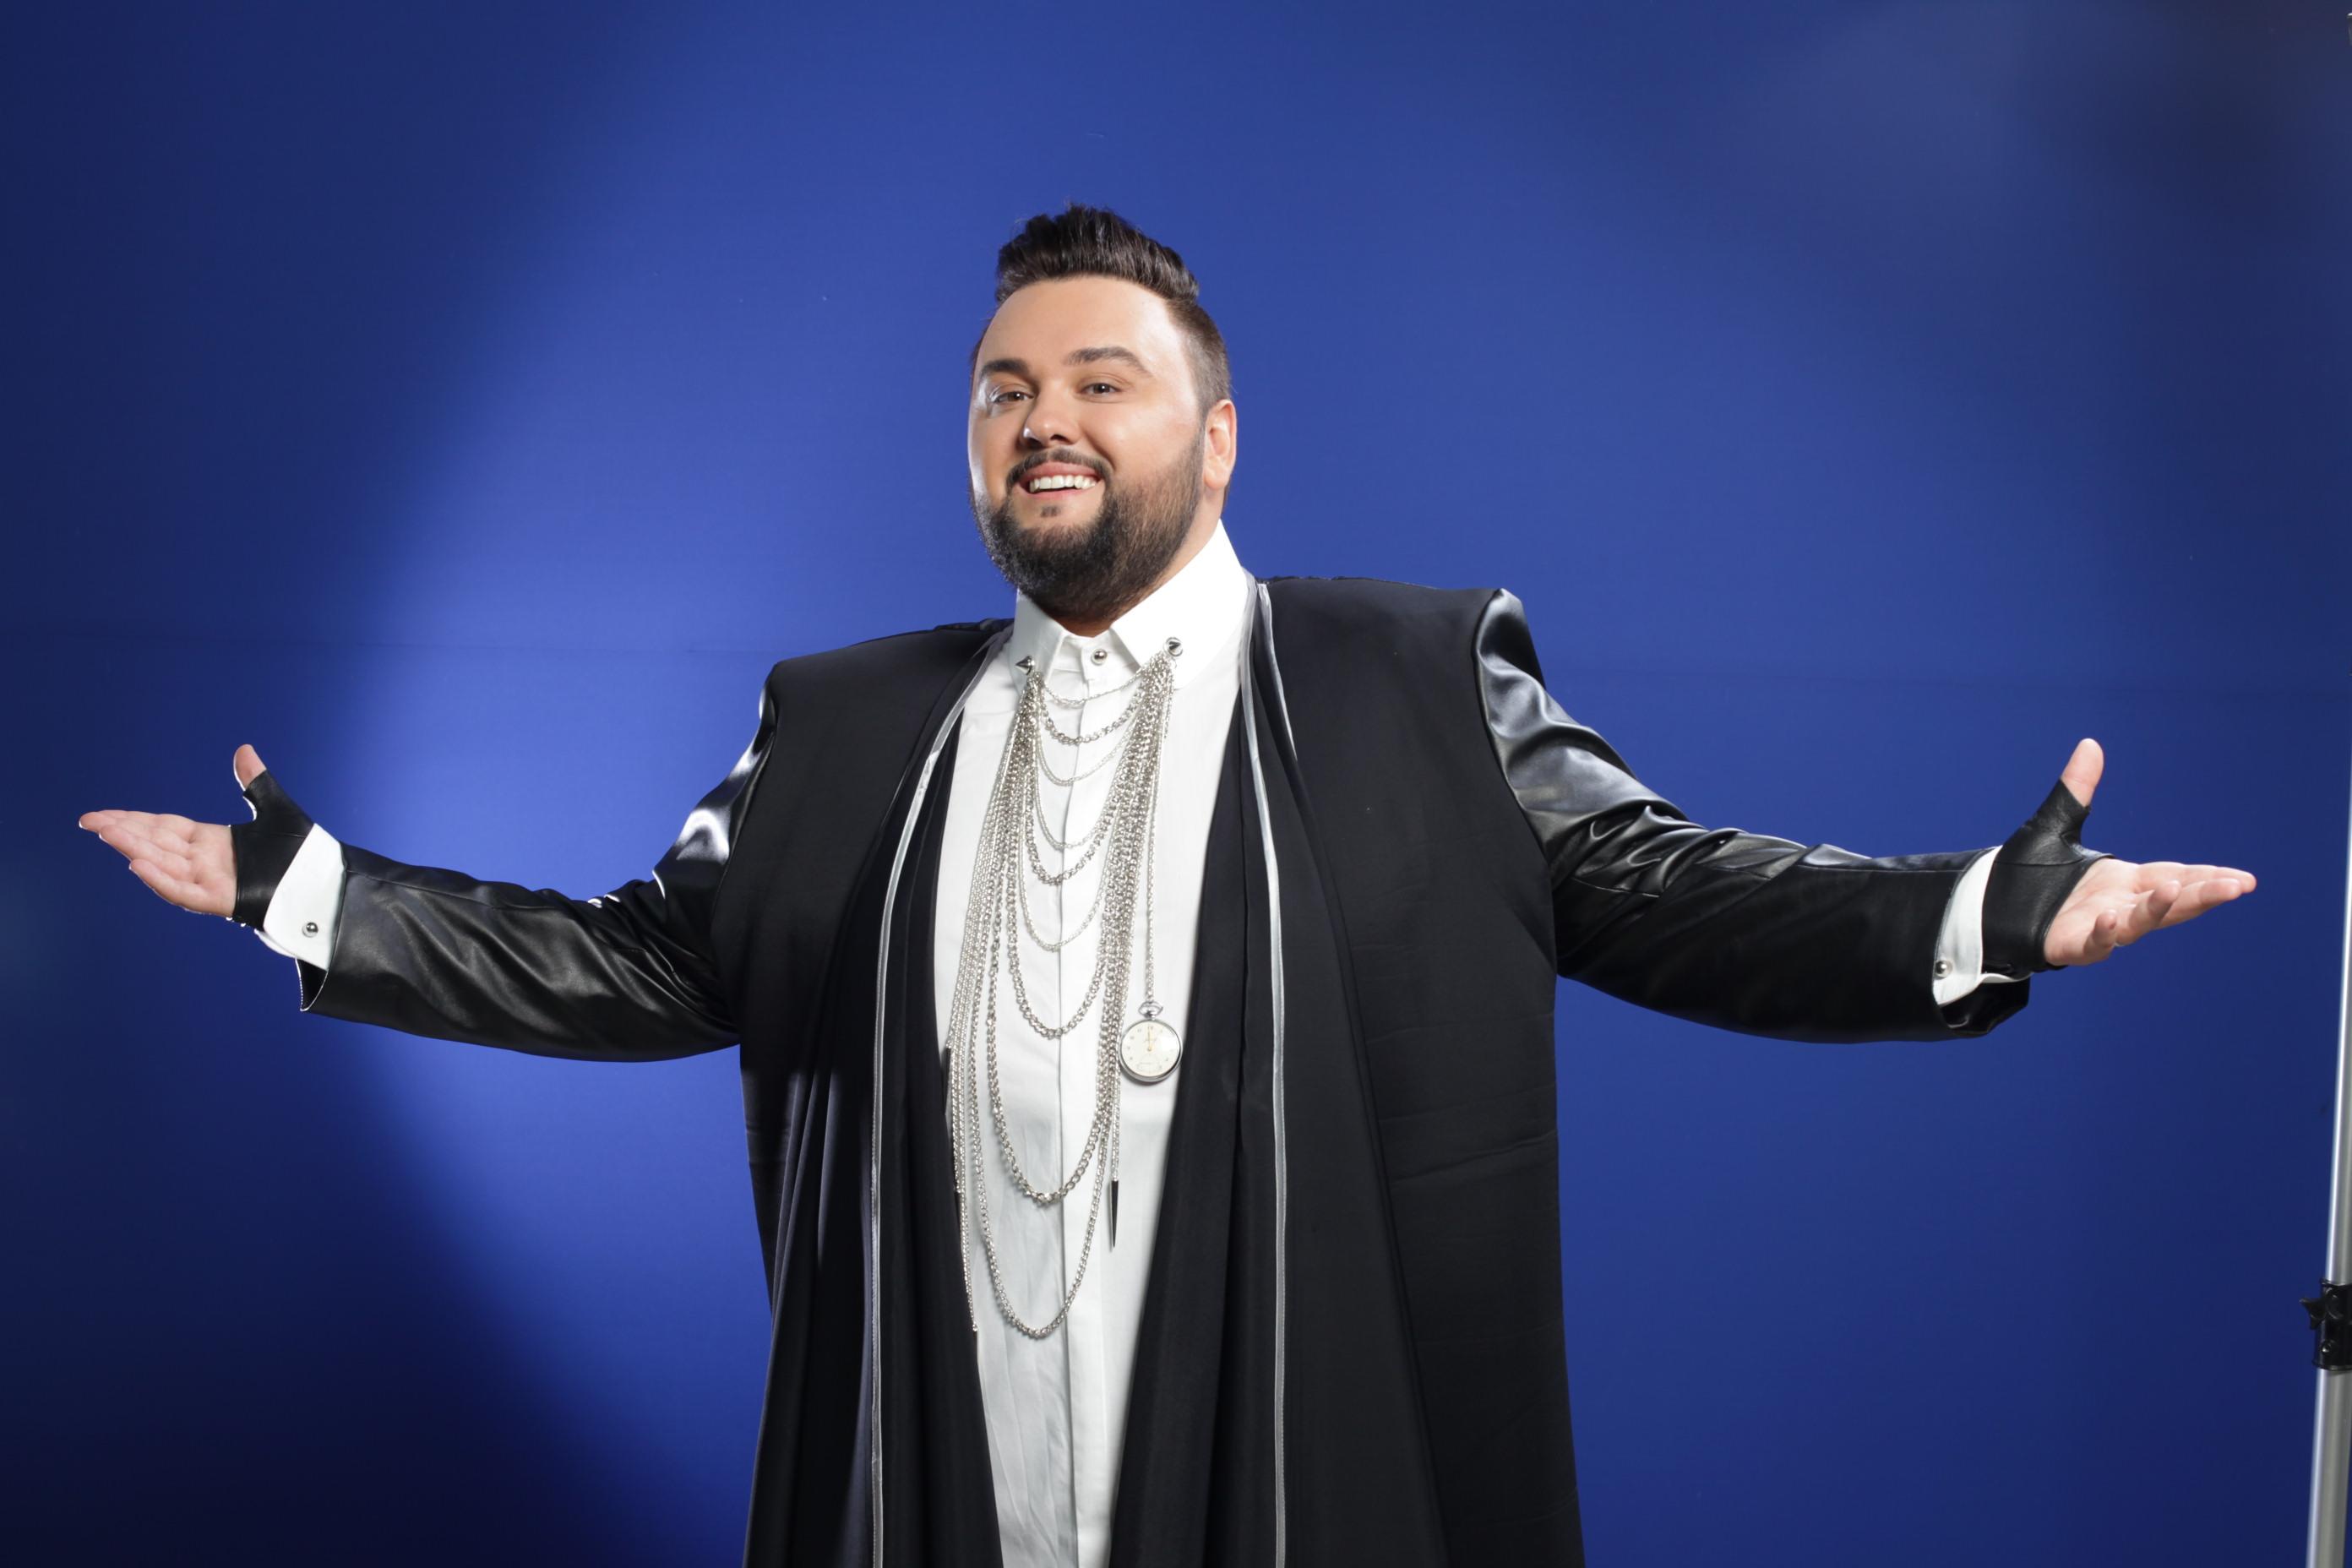 Eurovision 2017 – Jacques Houdek per la Croazia